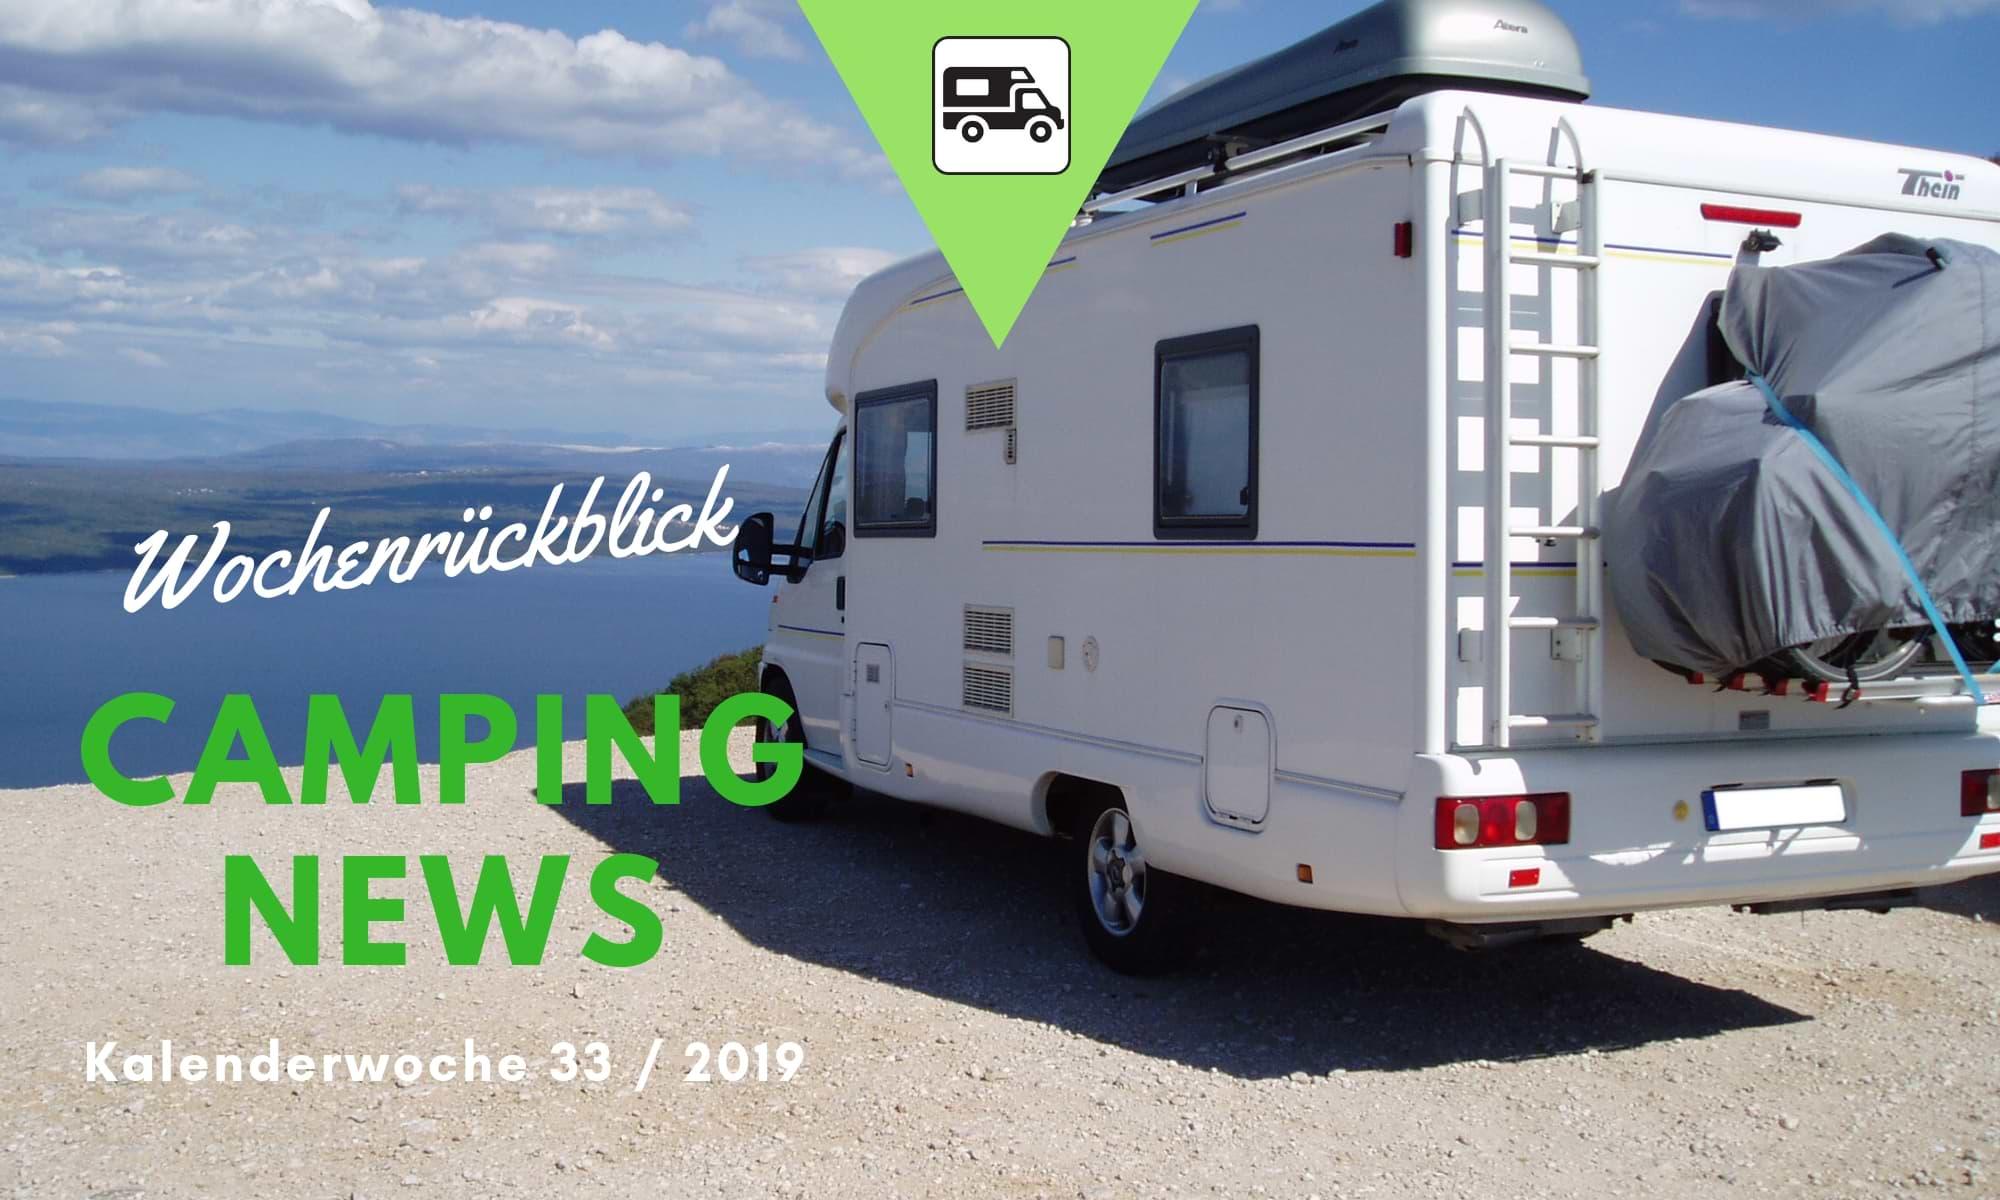 Wochenrückblick Camping News KW33-2019